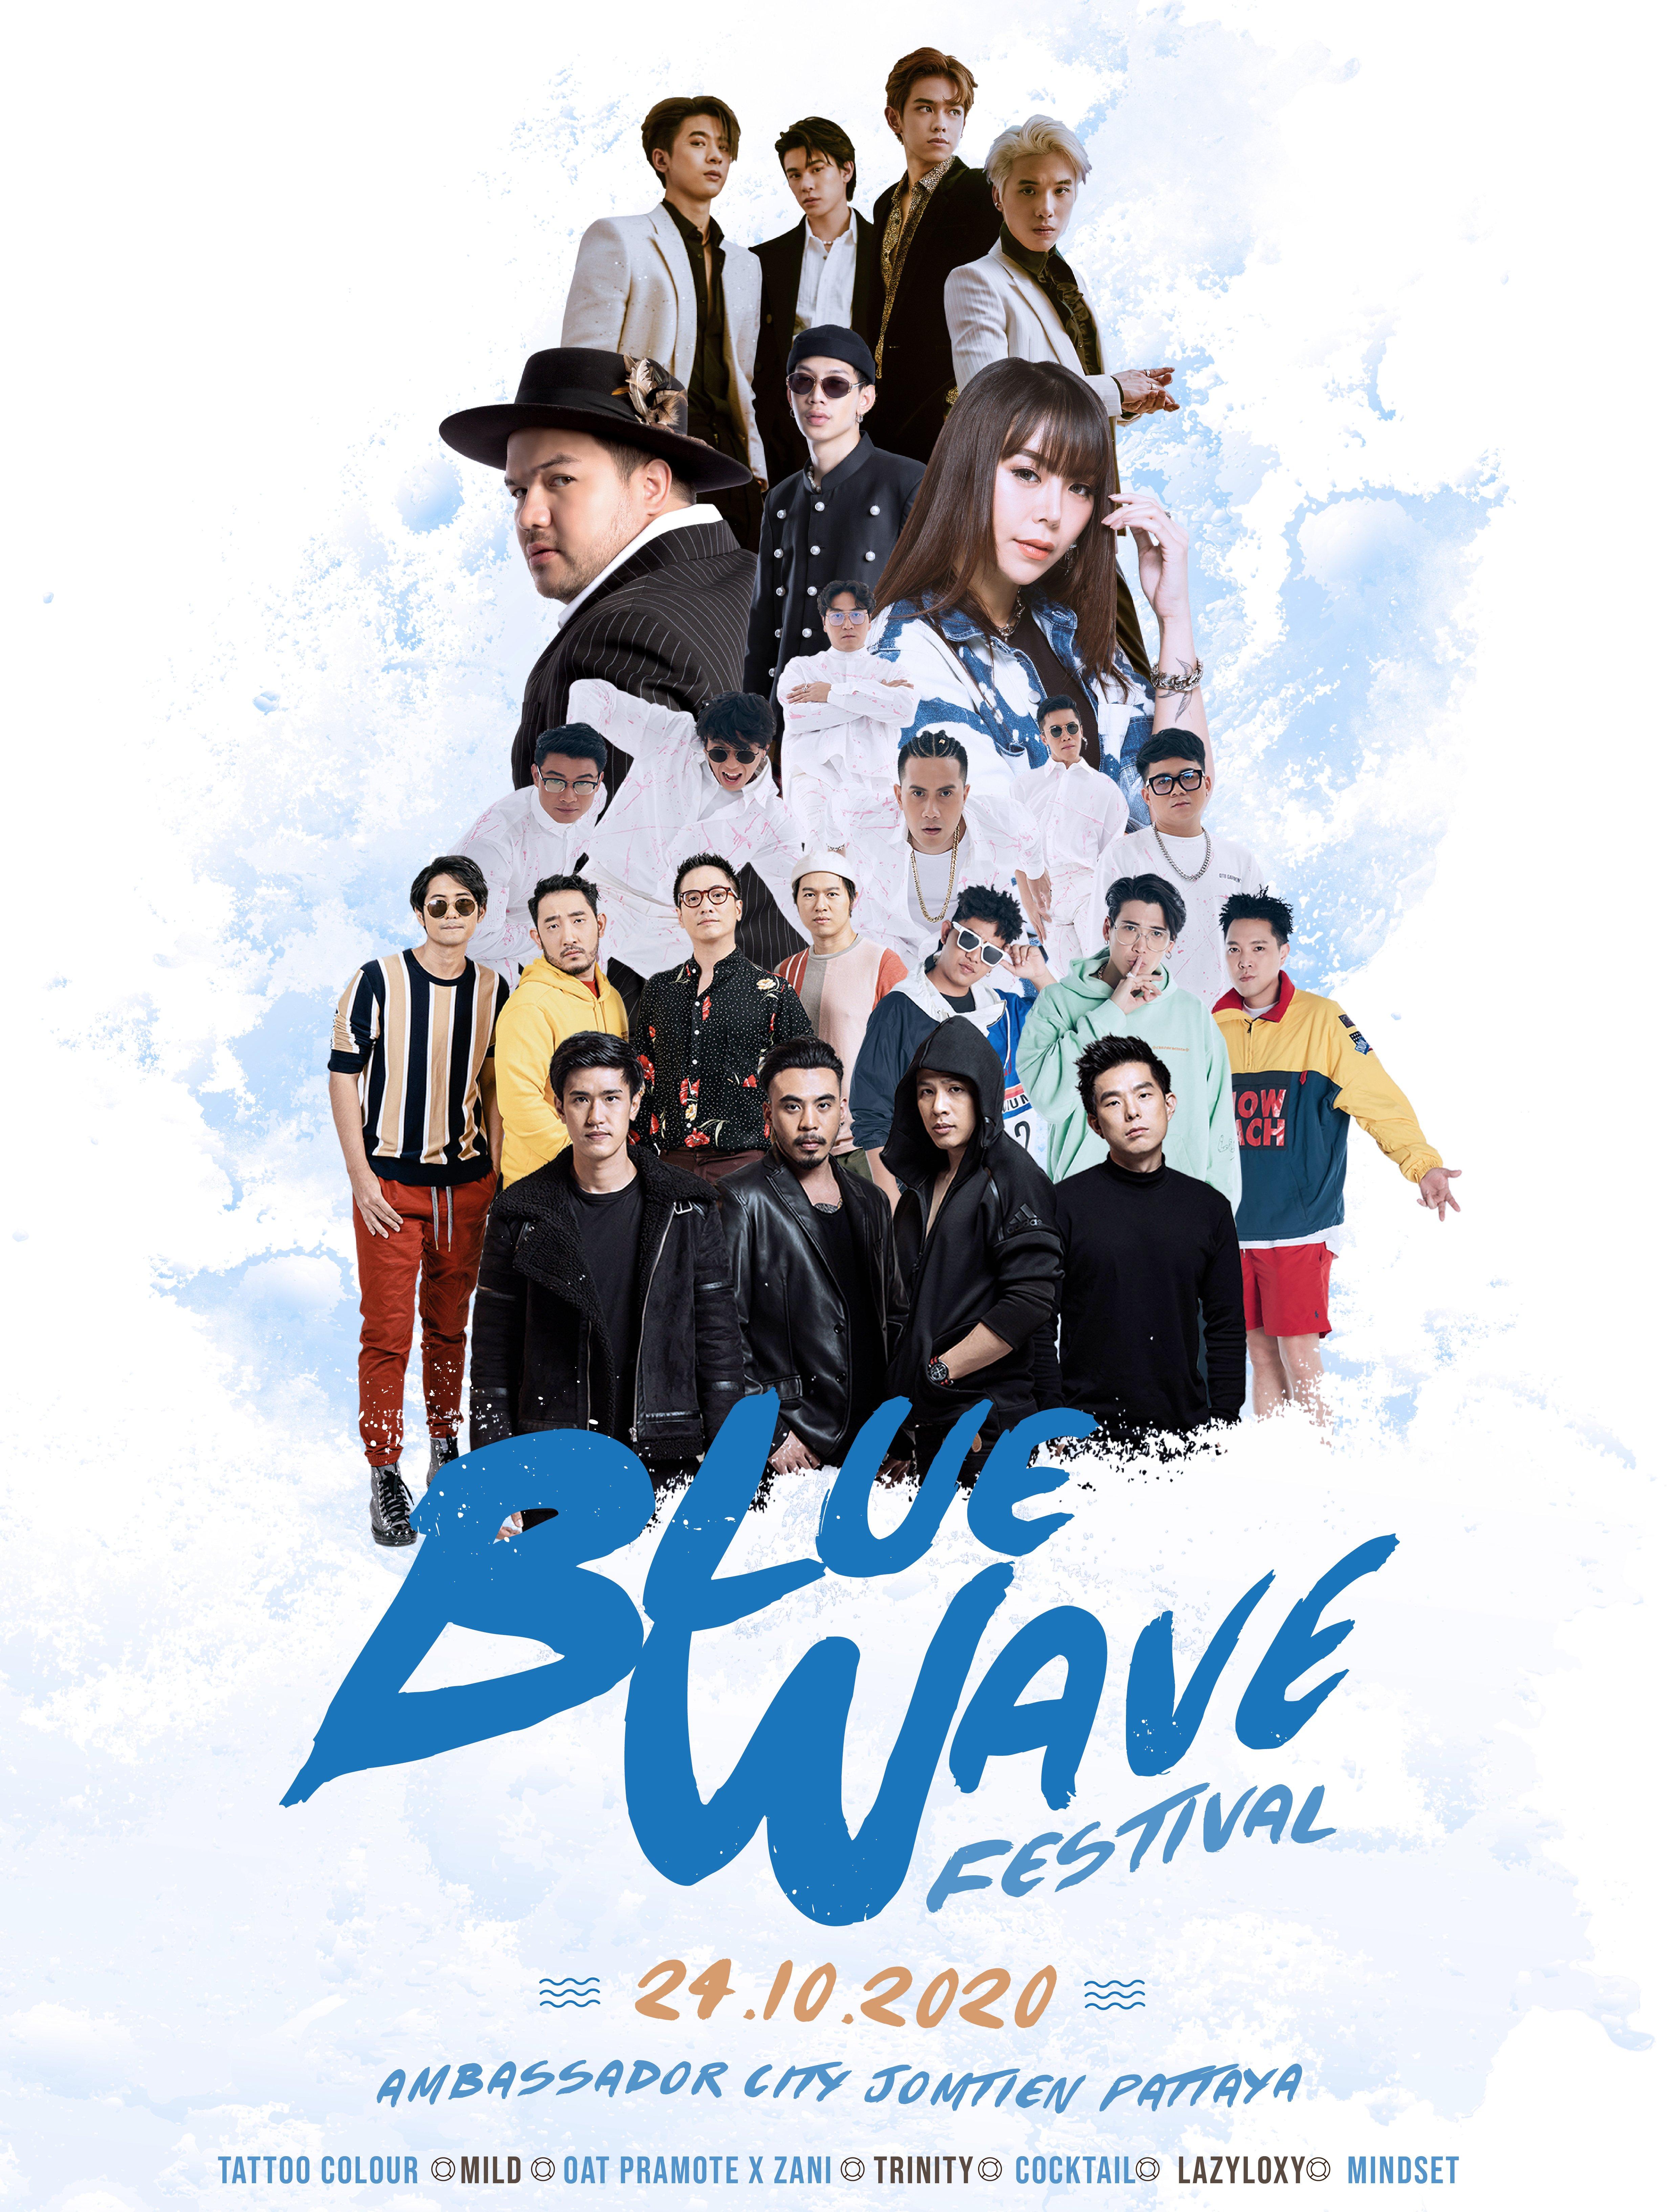 bluewavefestival.jpg